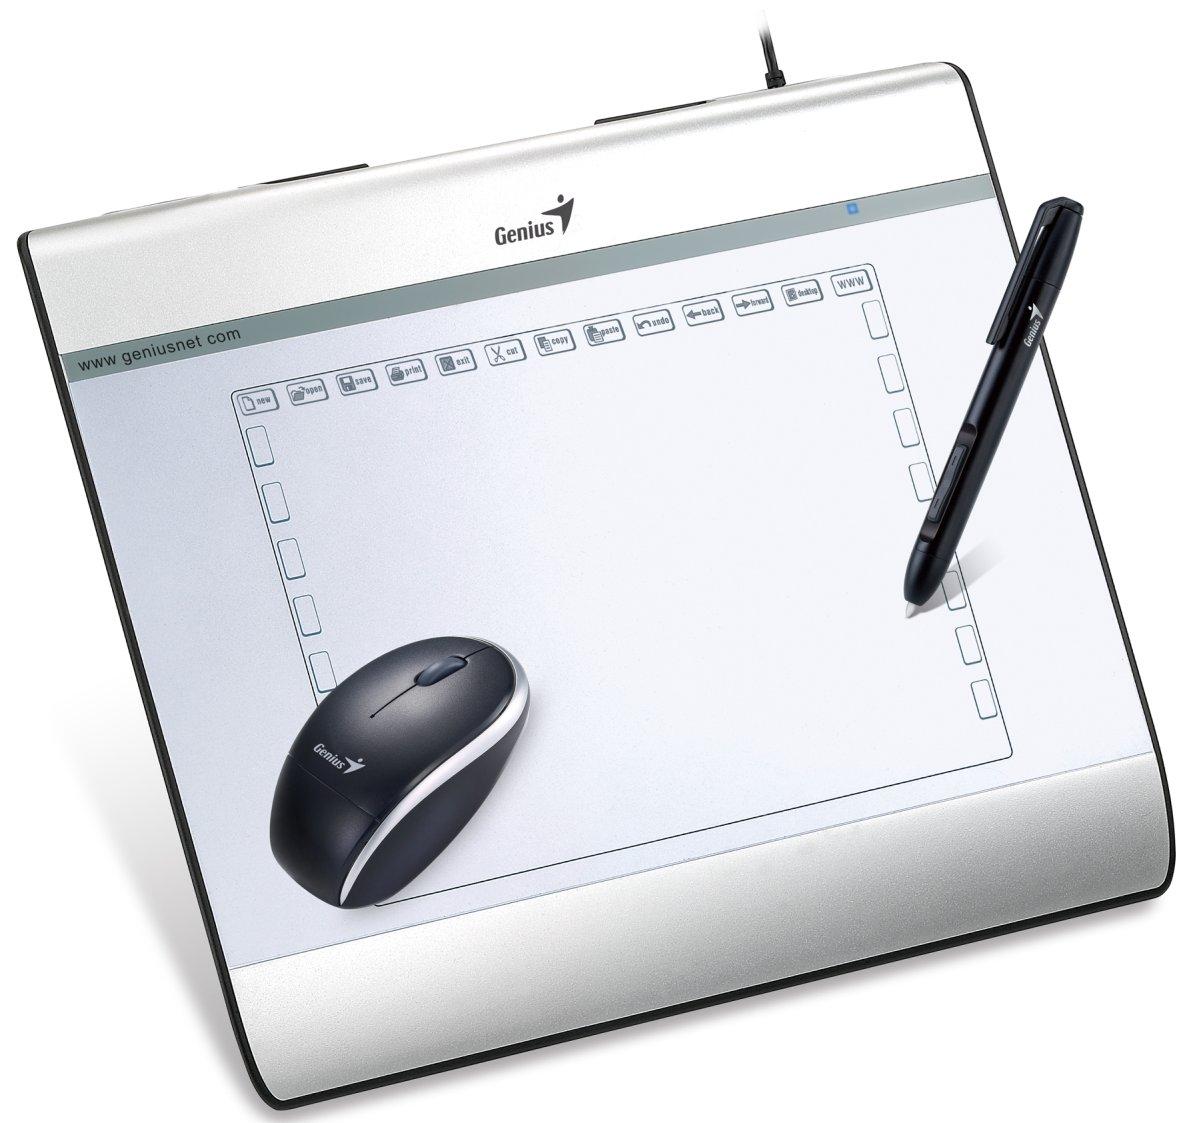 Mousepen i608x driver windows 10 servicedagor.